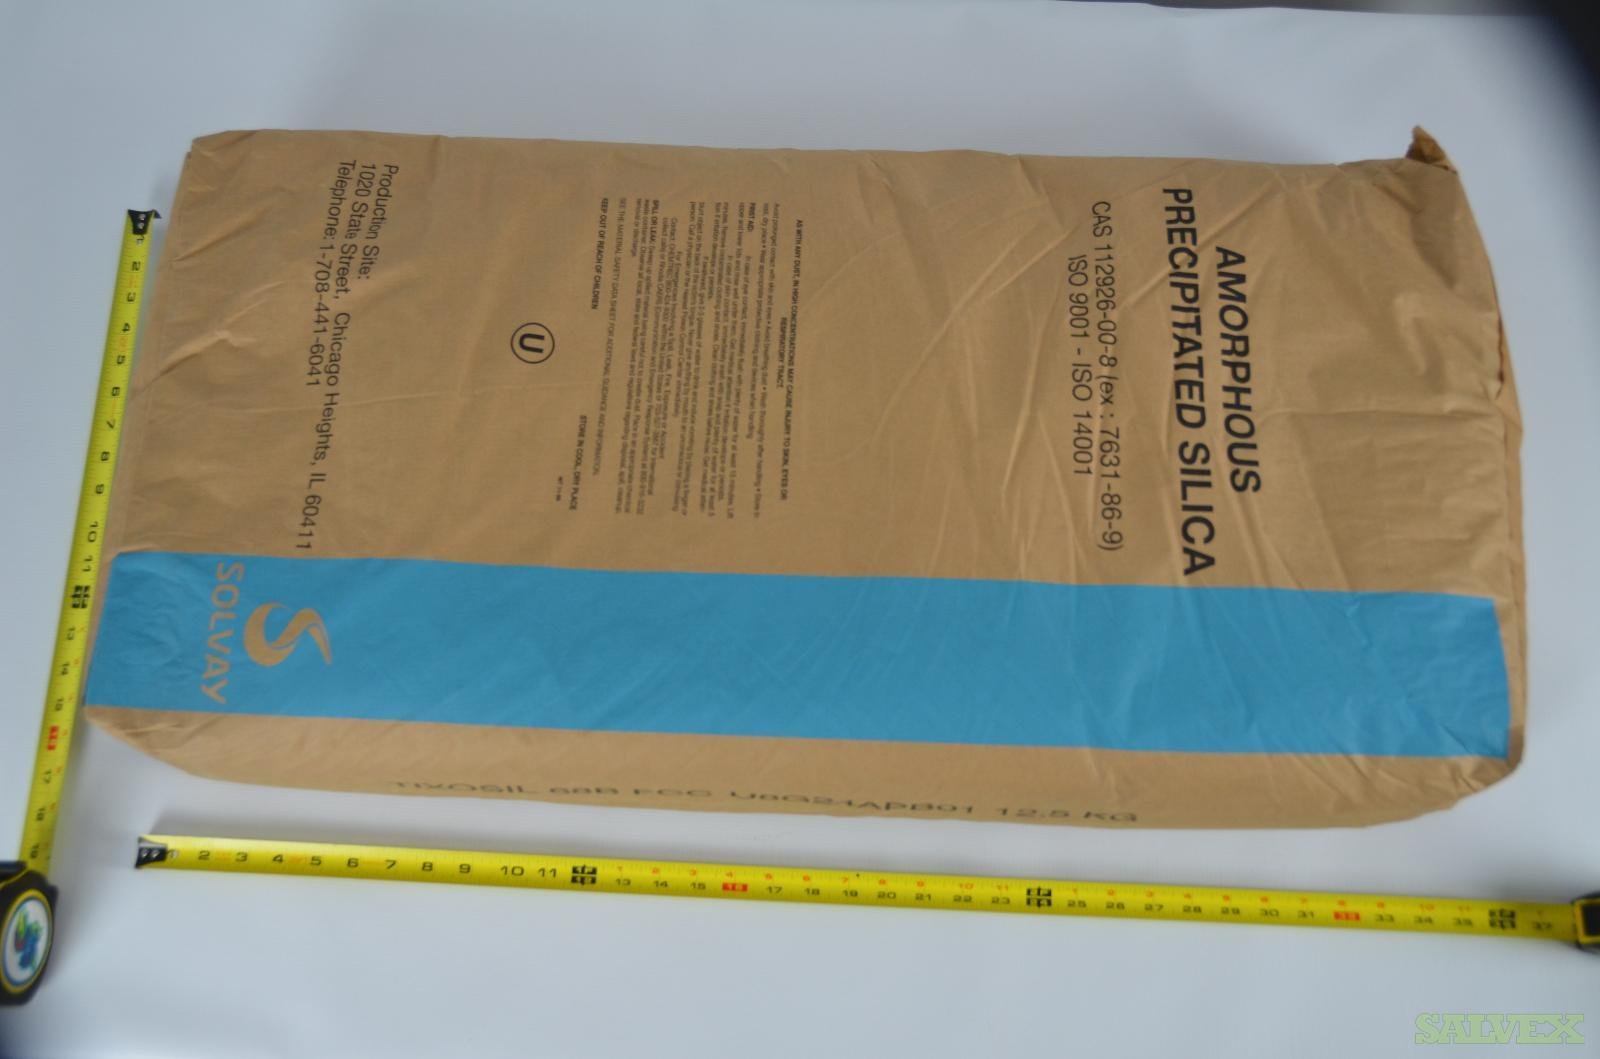 Solvay TixoSil 68B FCC Silica - For Use in Food-Grade Applications (35,000 Lbs / 4-5 Truckloads)